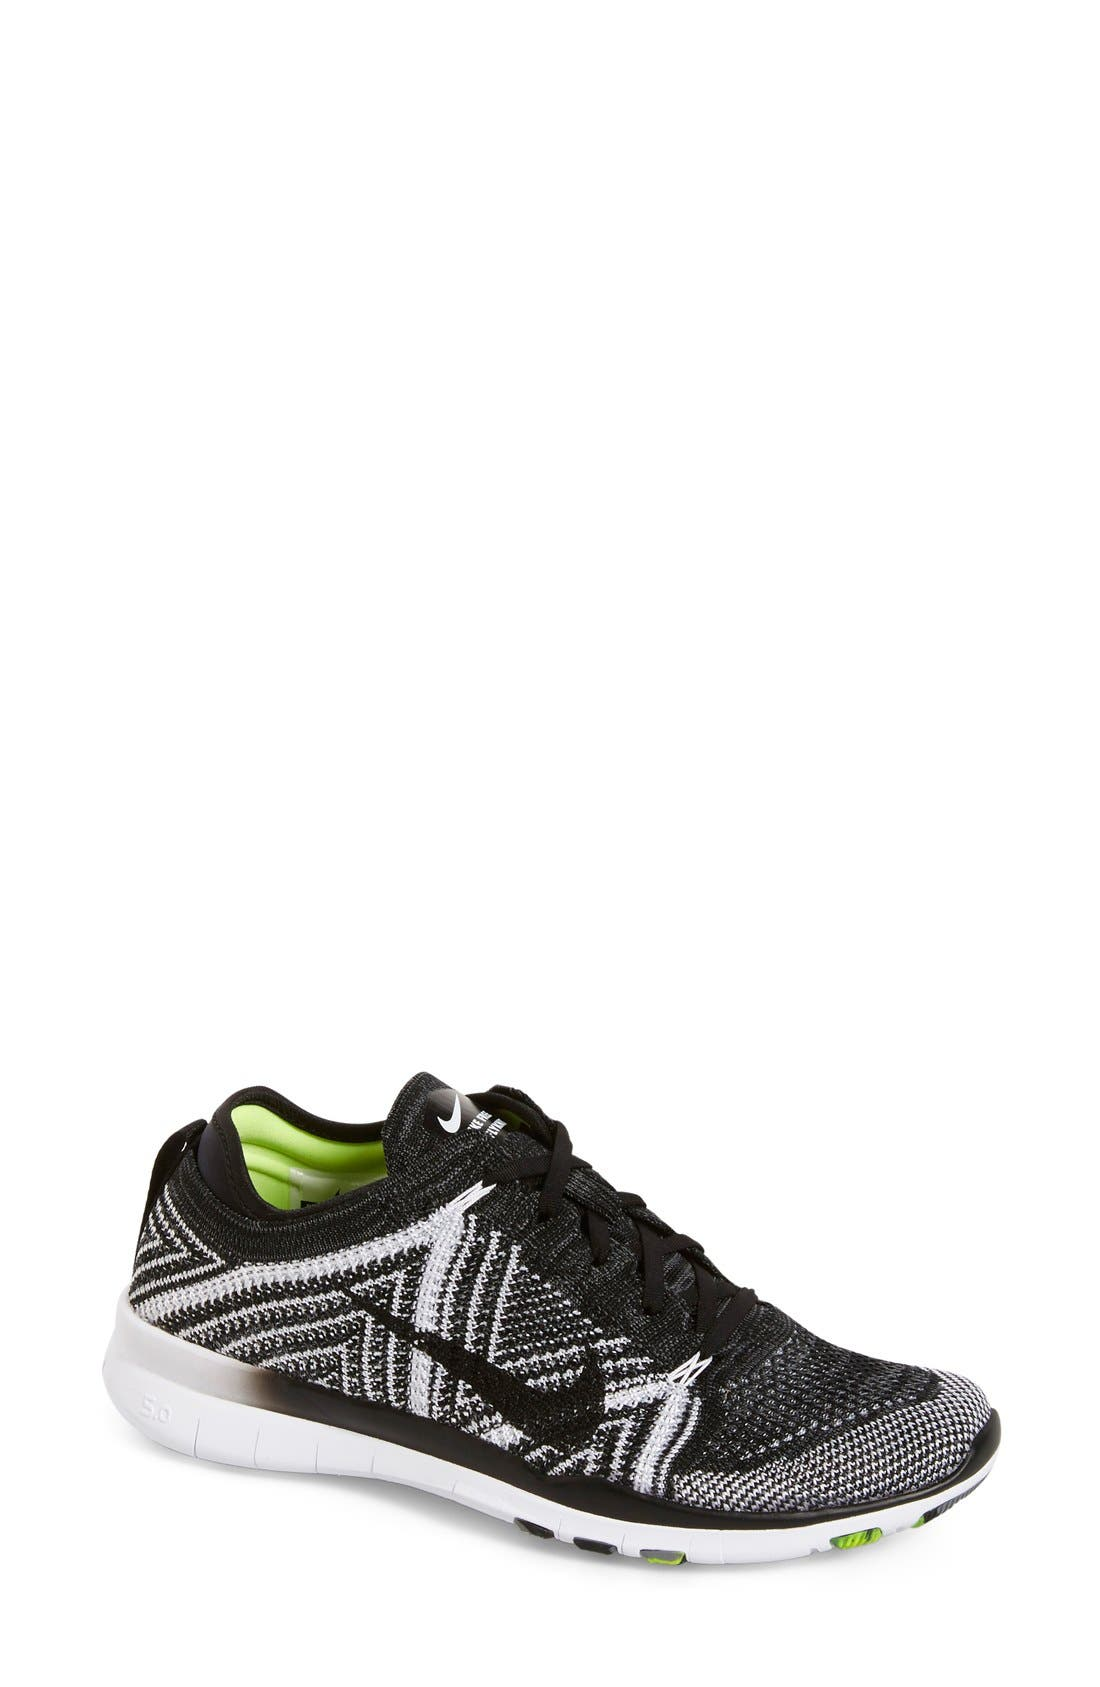 ,                             'Free Flyknit 5.0 TR' Training Shoe,                             Main thumbnail 8, color,                             004